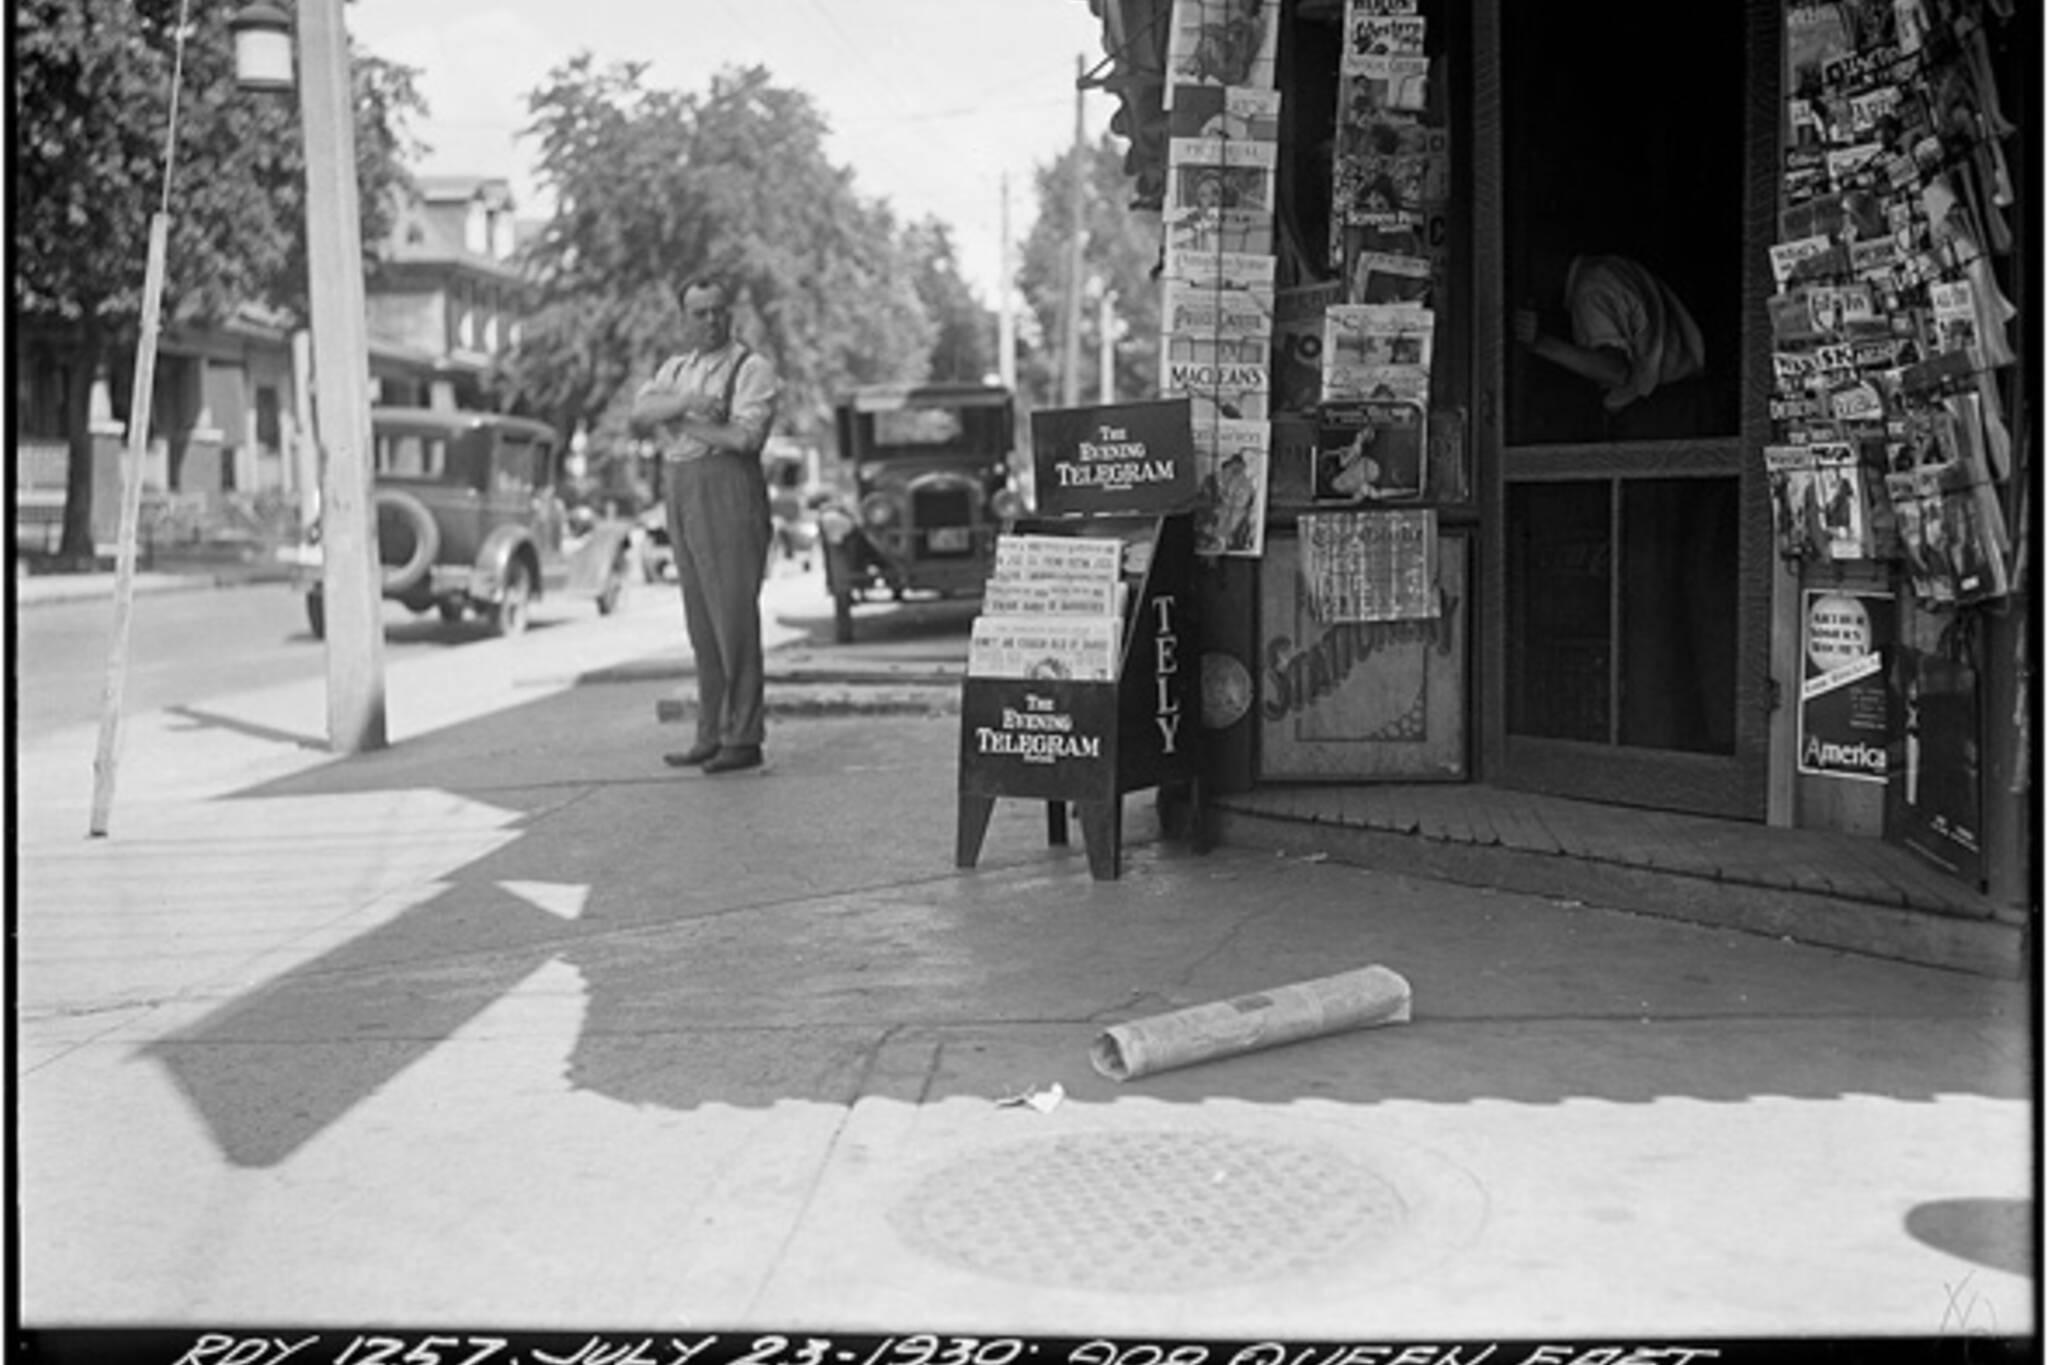 Toronto Newspapers History